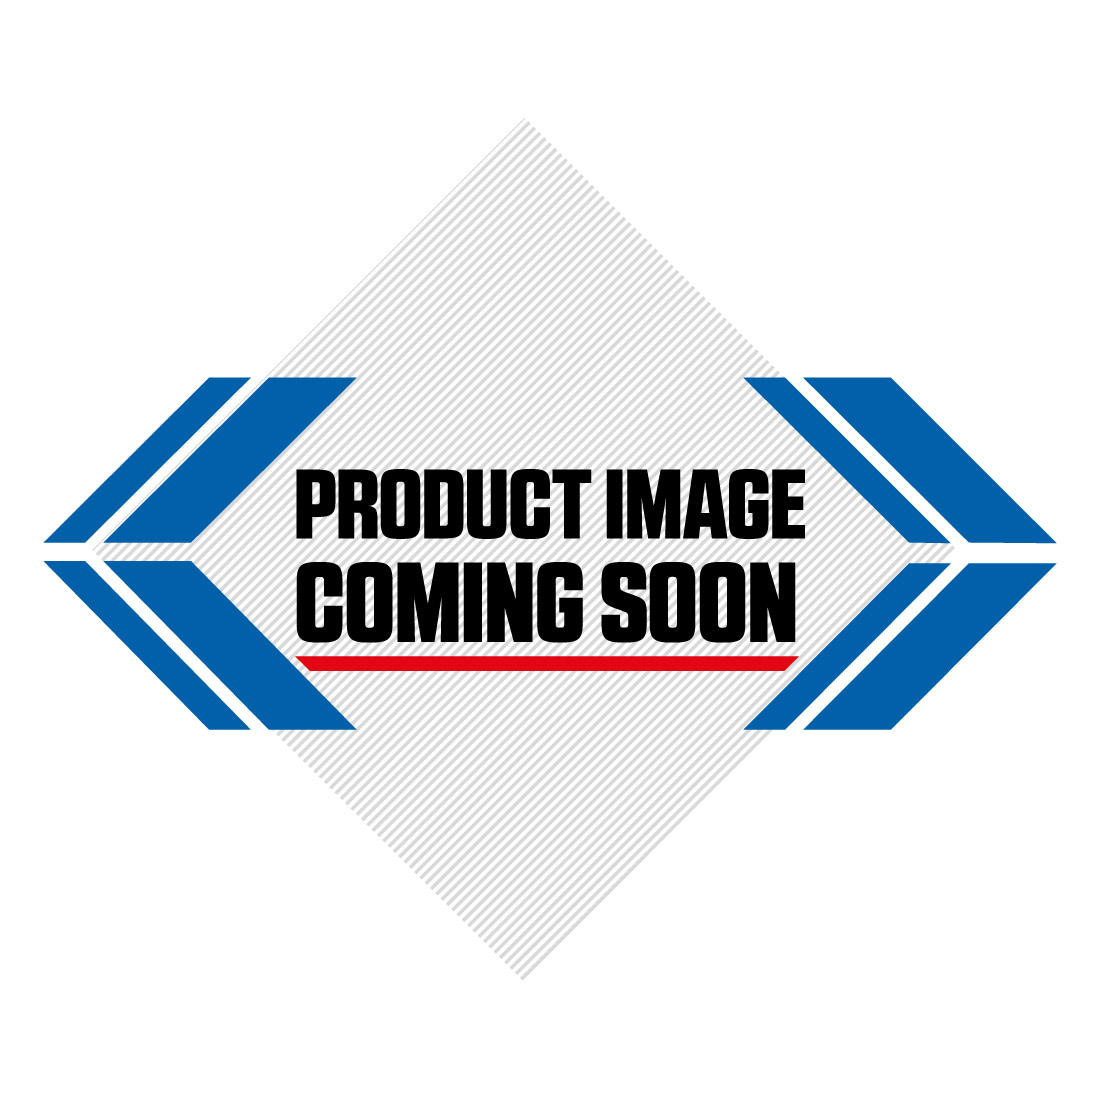 Honda Plastic Kit CRF 250 (18-20) 450 (17-20) OEM Factory Image-1>